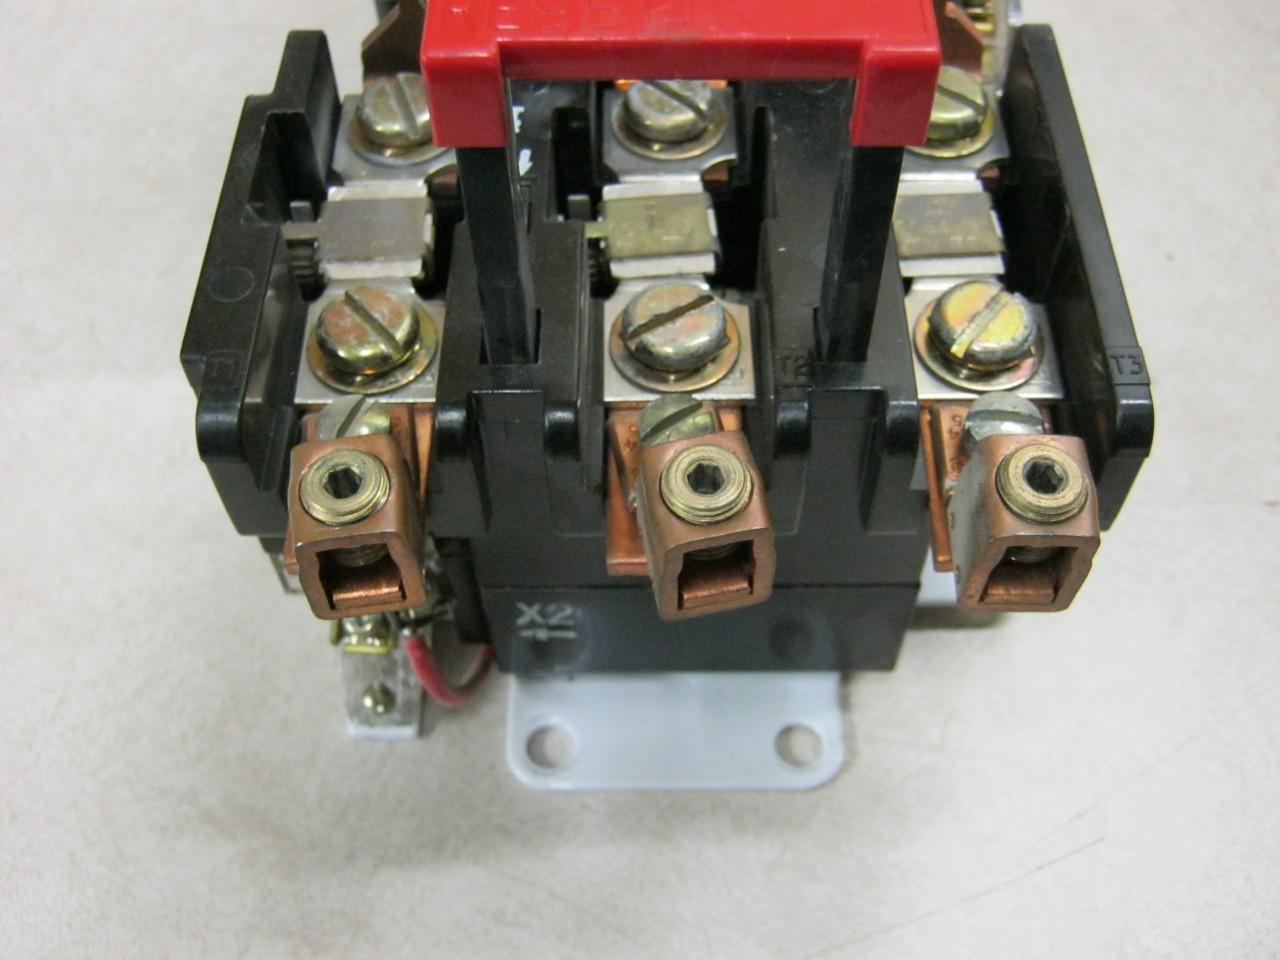 Square d nema size3 50 hp max motor starter class 8536 for Square d motor starter